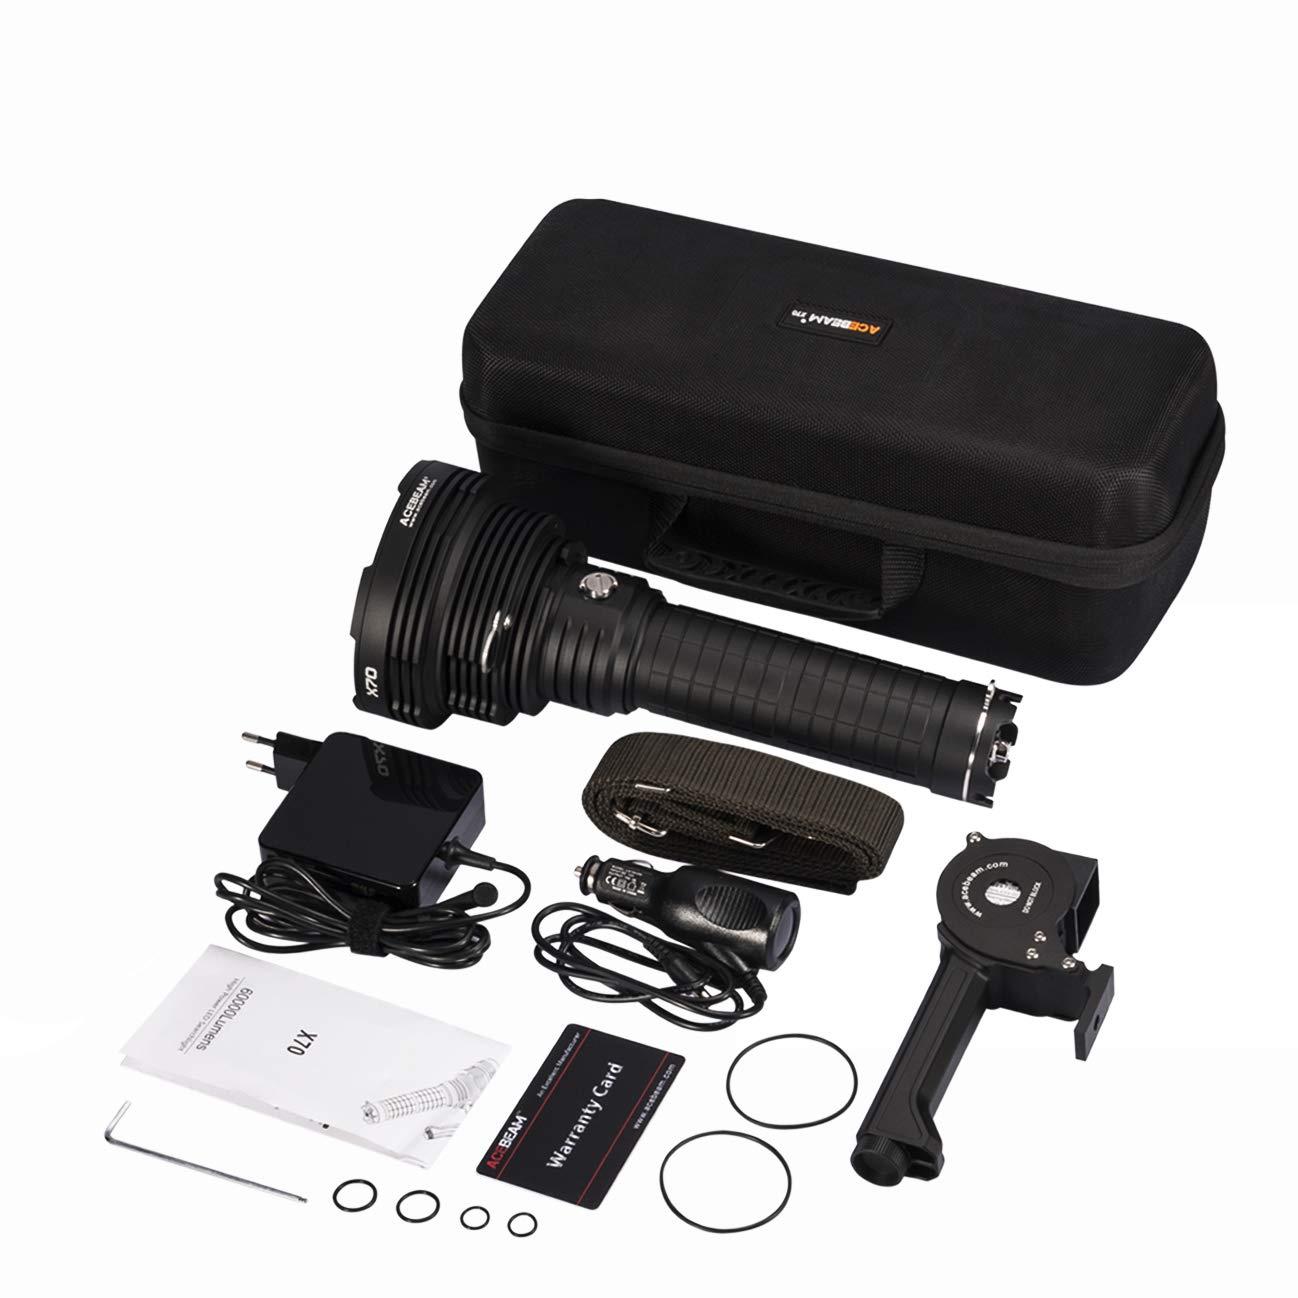 ACEBEAM X70 Brightest Flashlight 60,000 Lumens Cree XHP70.2 + XHP35 LED 3773ft Long Throw Super High Lumens Flashlight Built-in Battery